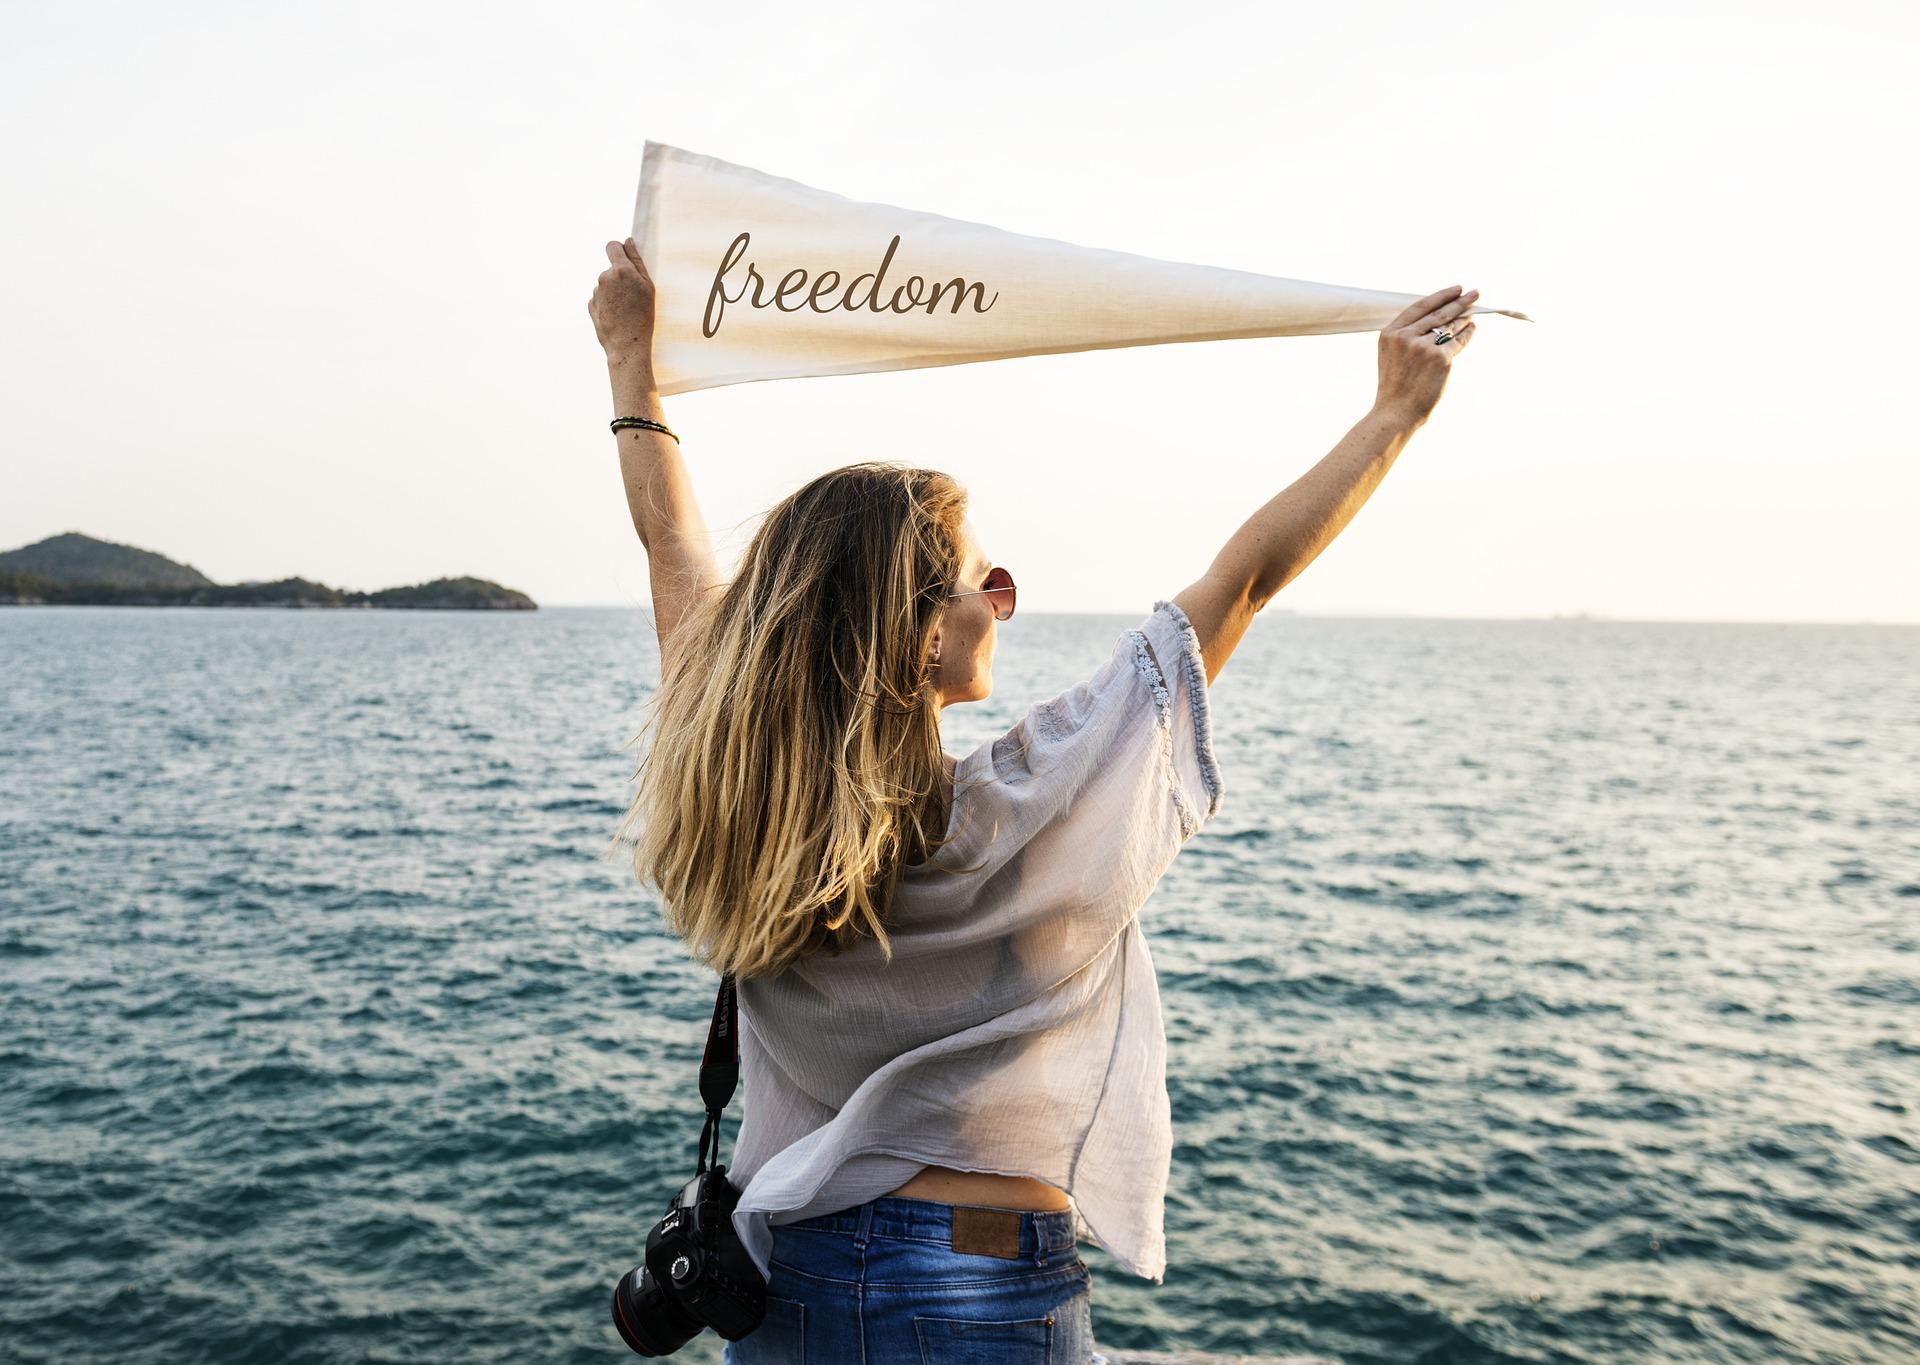 Libertad, descanso